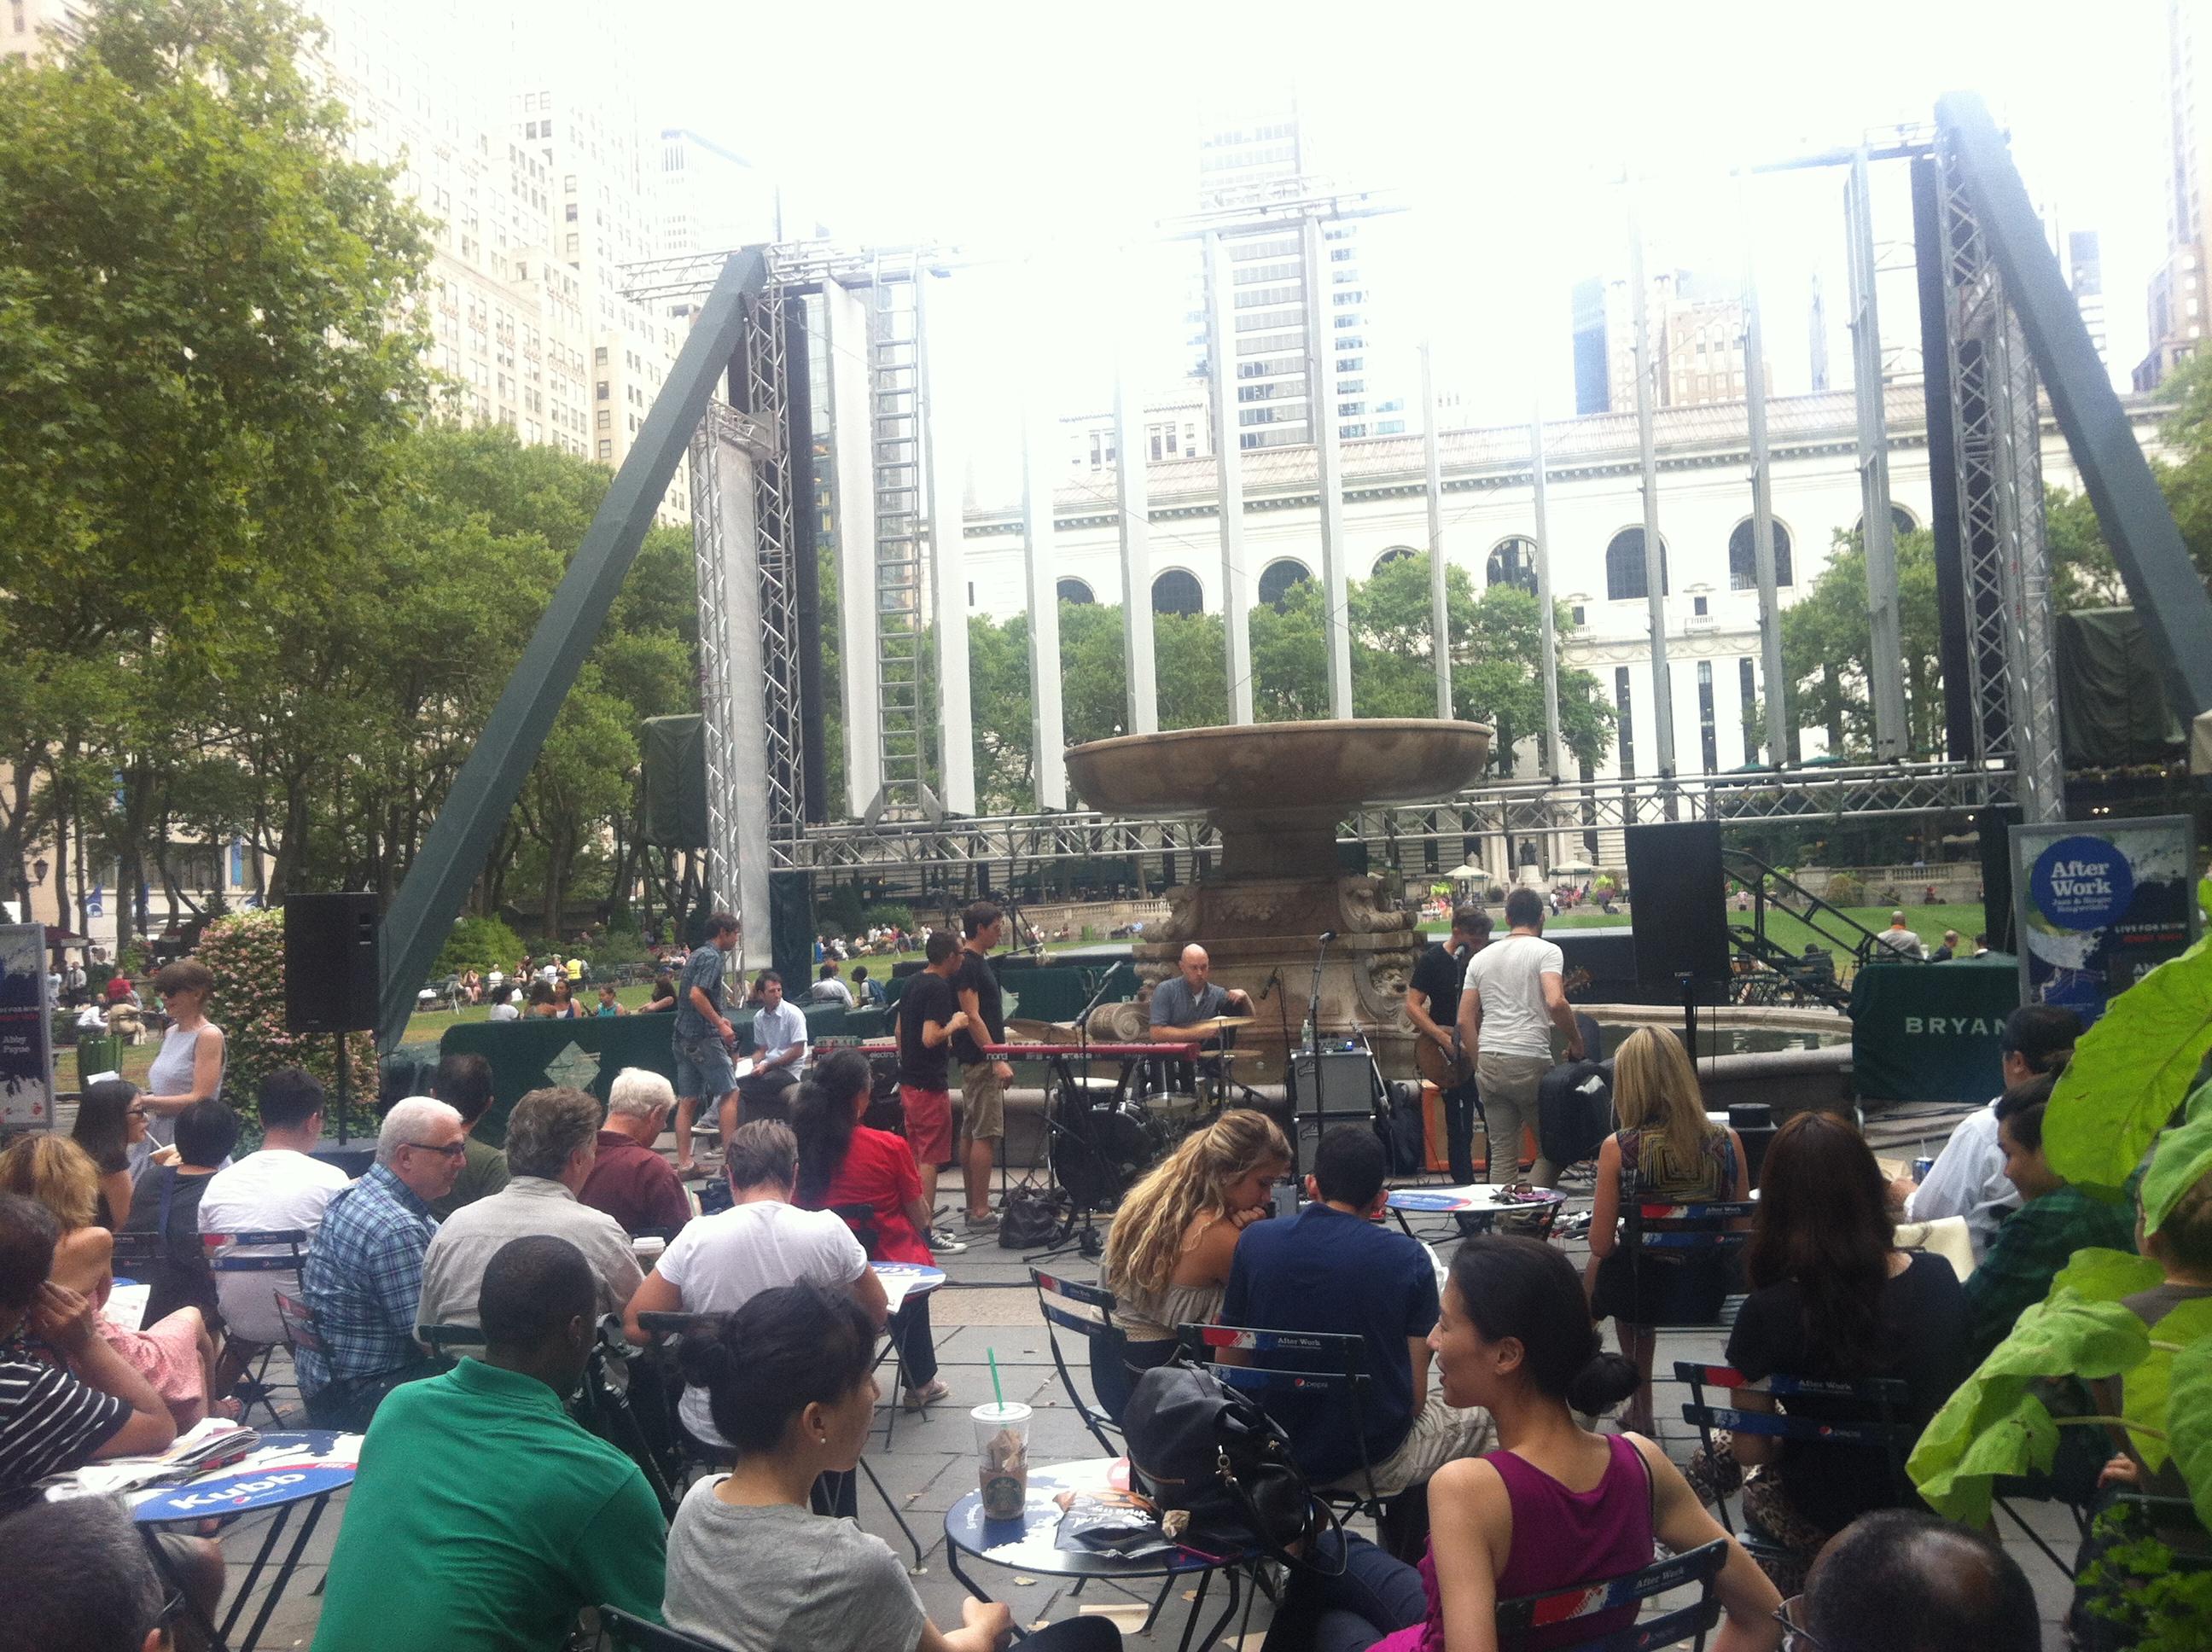 纽约一景——bryant park_图1-3